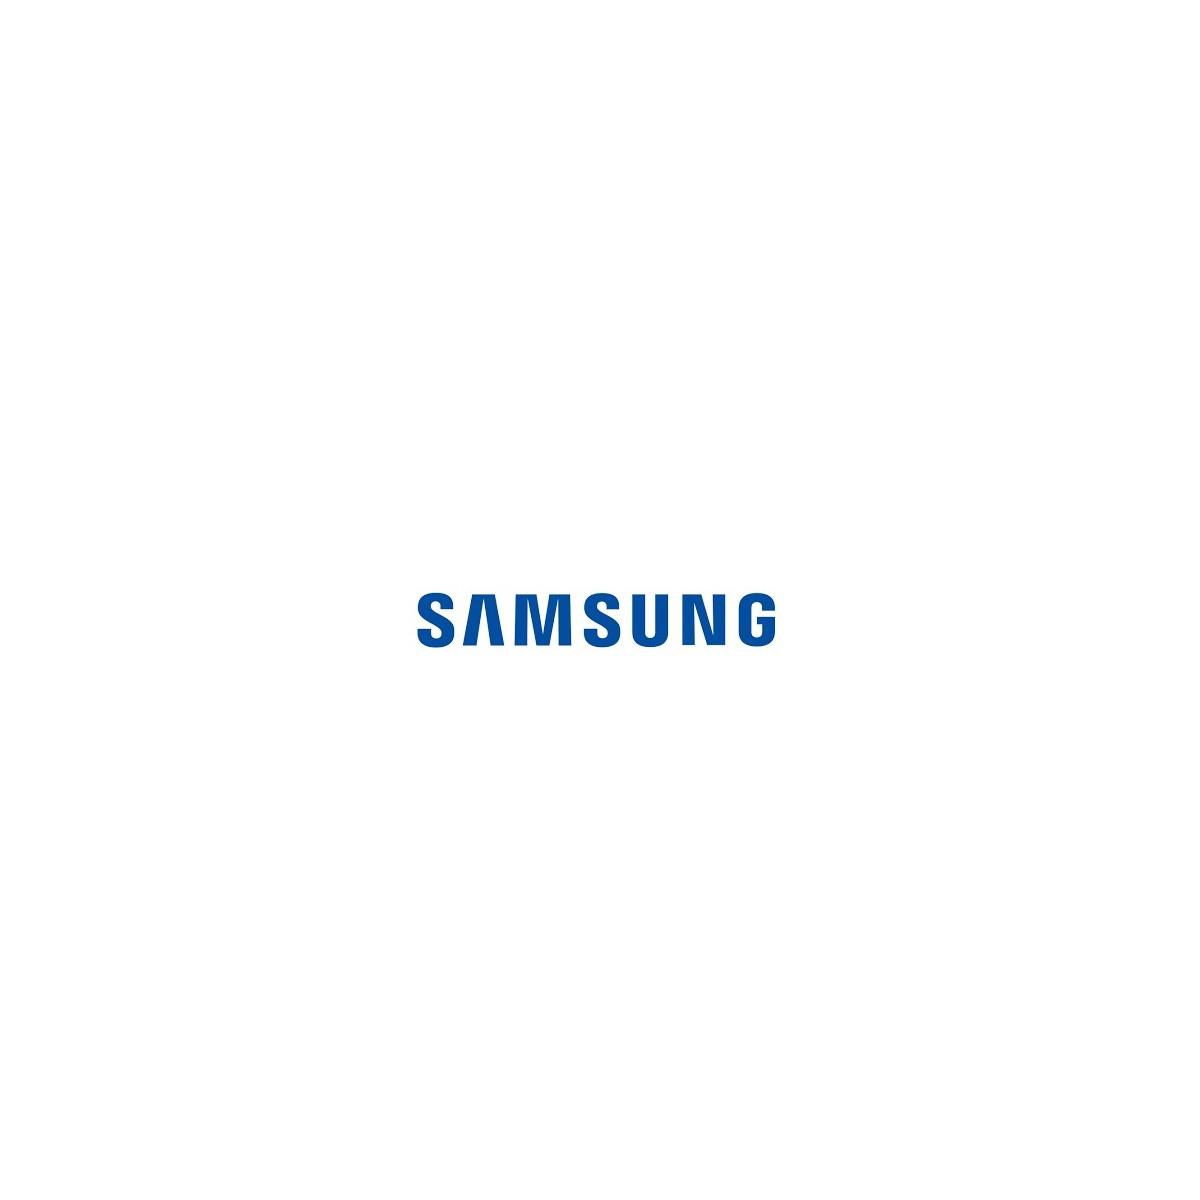 Licenza MGI Officeserv 7200 Lite Samsung